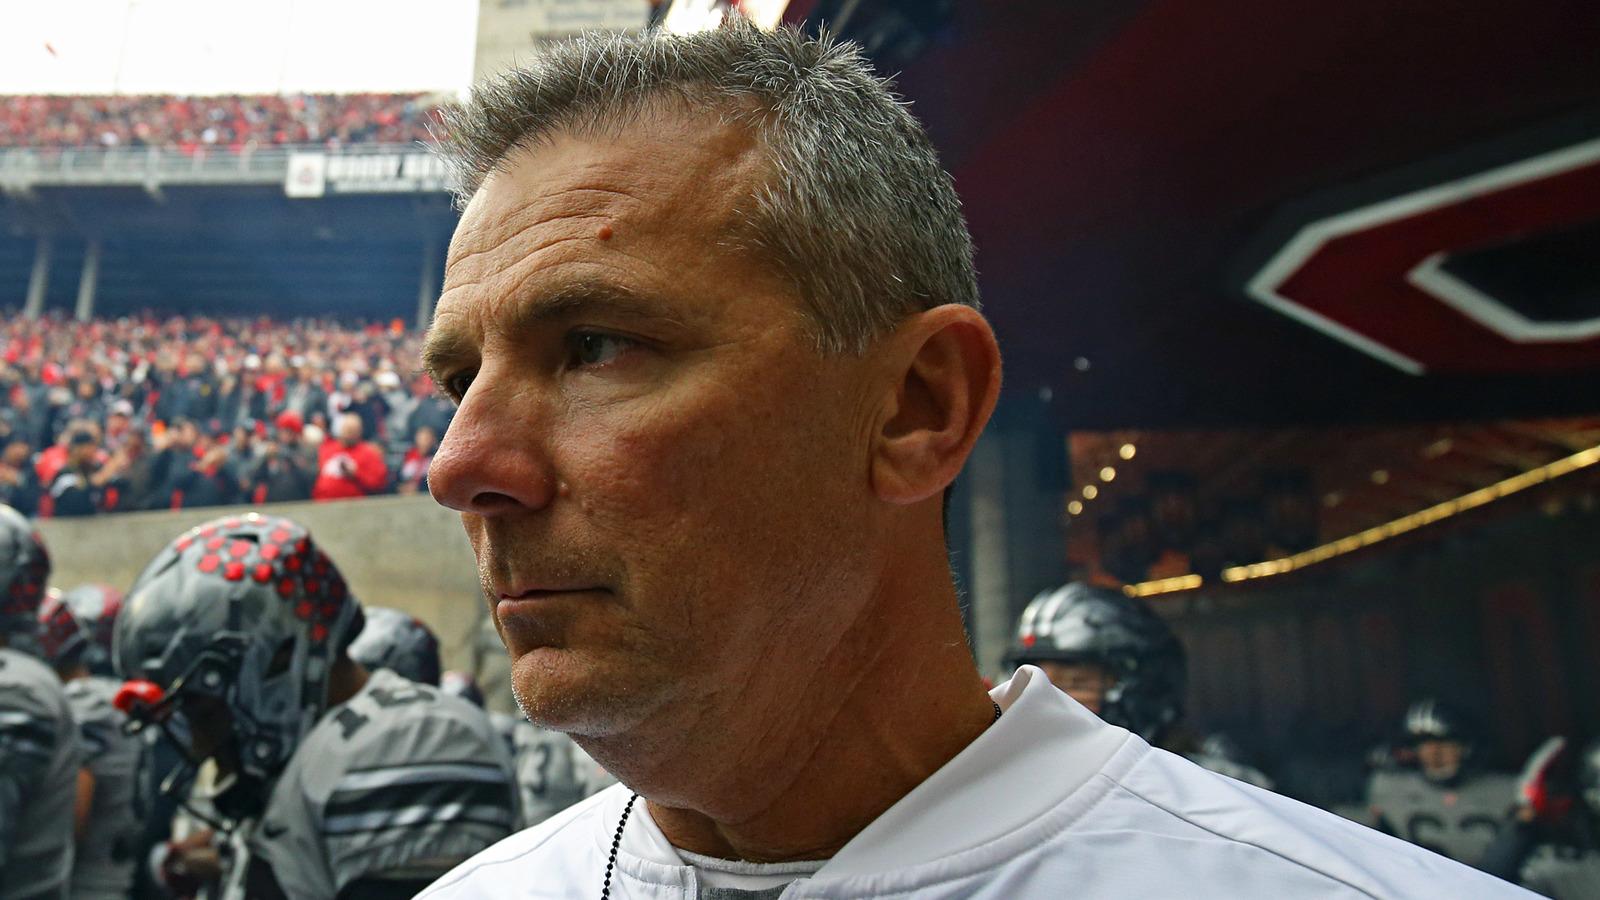 Urban Meyer's Son Nate Signs Letter Of Intent With Cincinnati Baseball |  Yardbarker.com